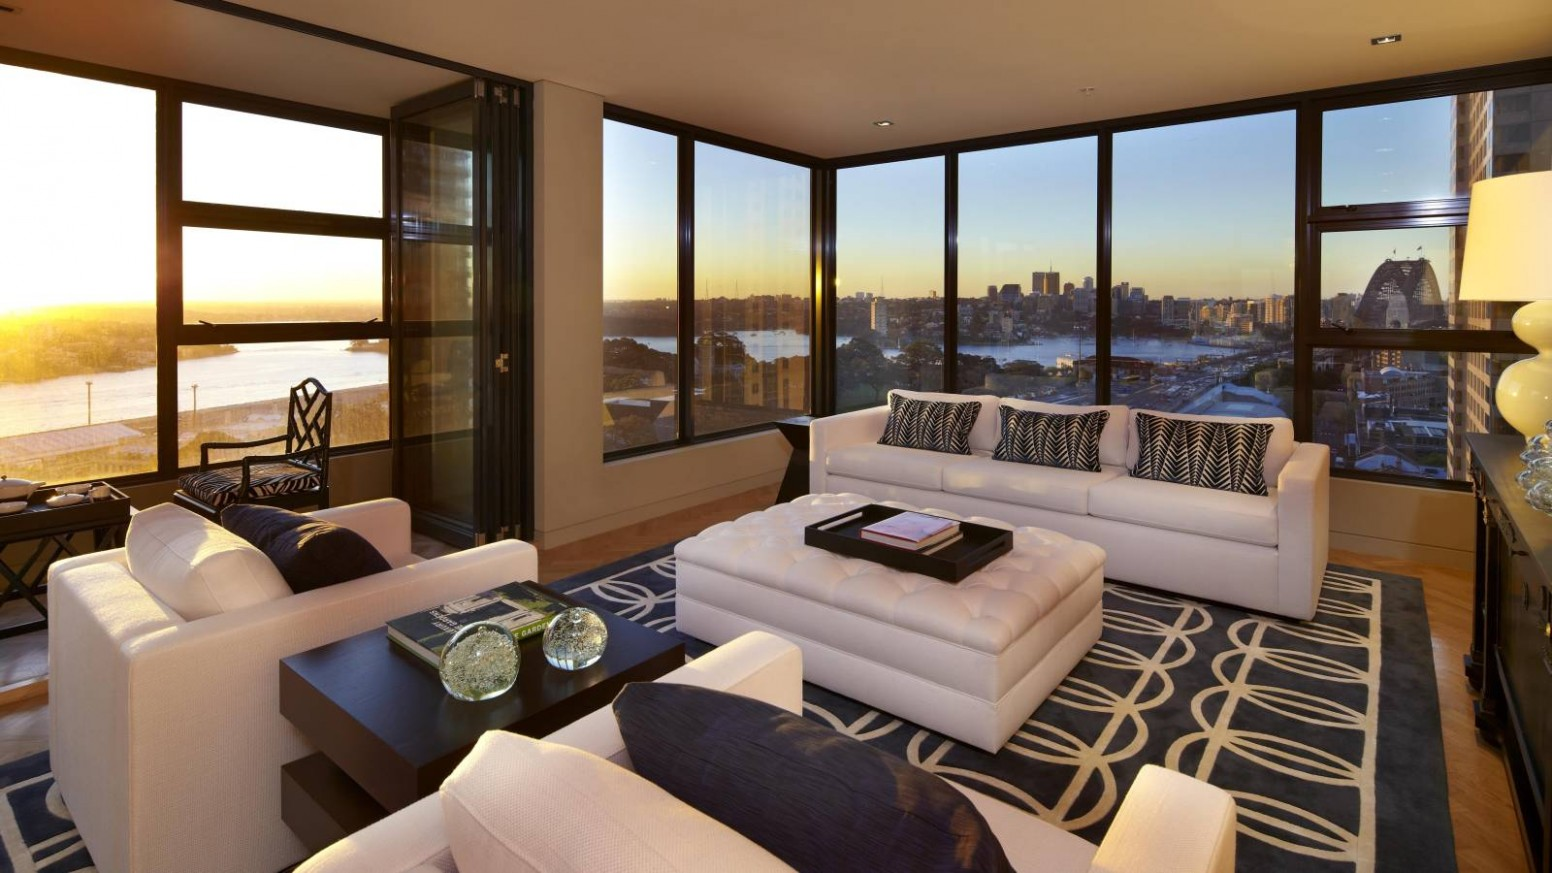 12 Inspirational House Window Photos - Interior Design Inspirations - Apartment Design Large Windows